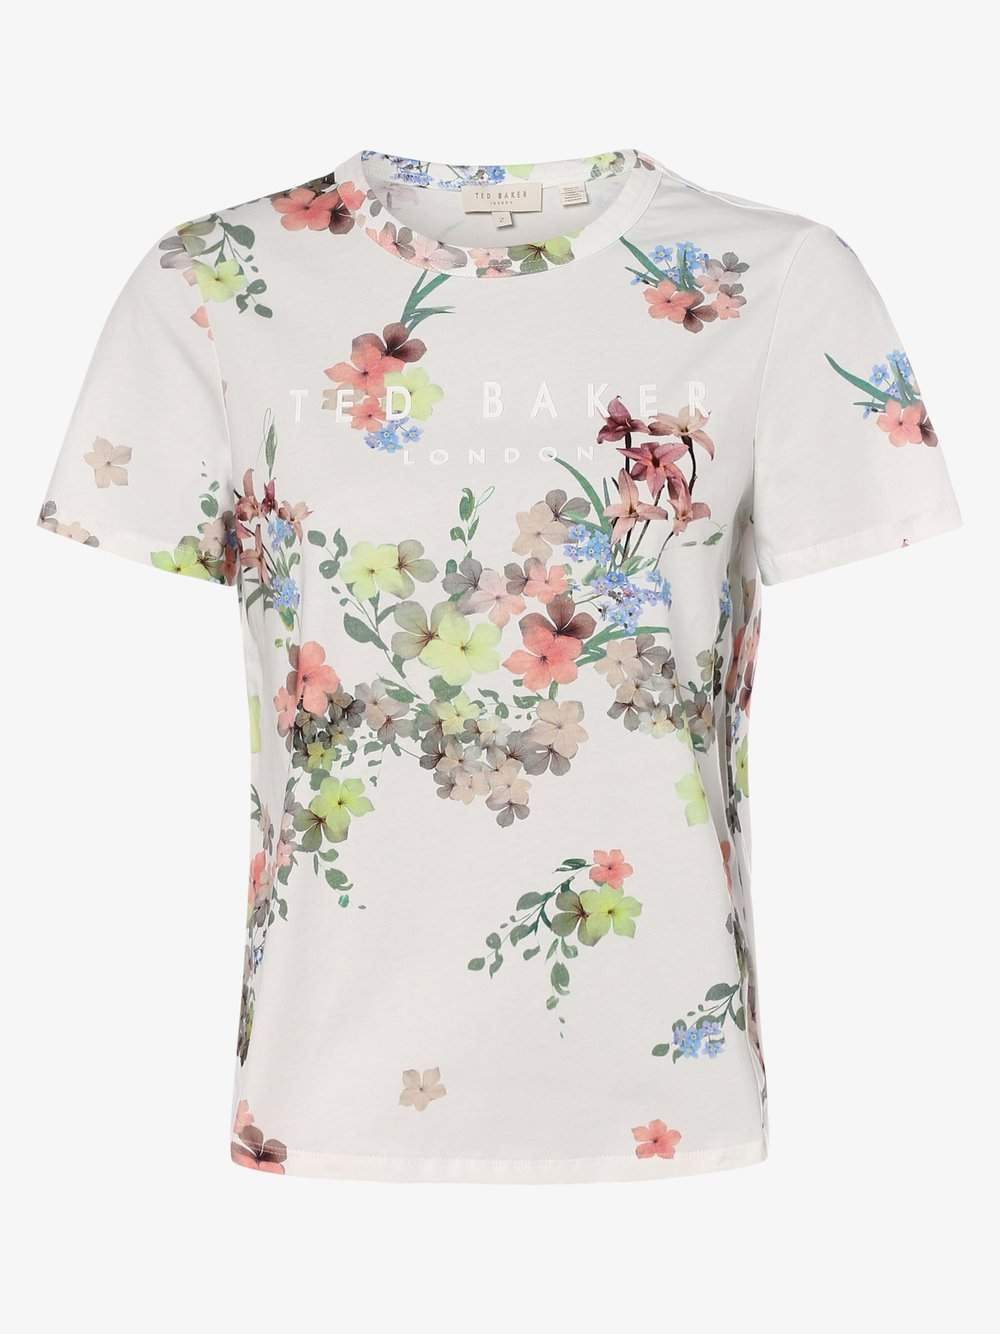 Ted Baker – T-shirt damski – Lileeyy, beżowy Van Graaf 487517-0001-00360